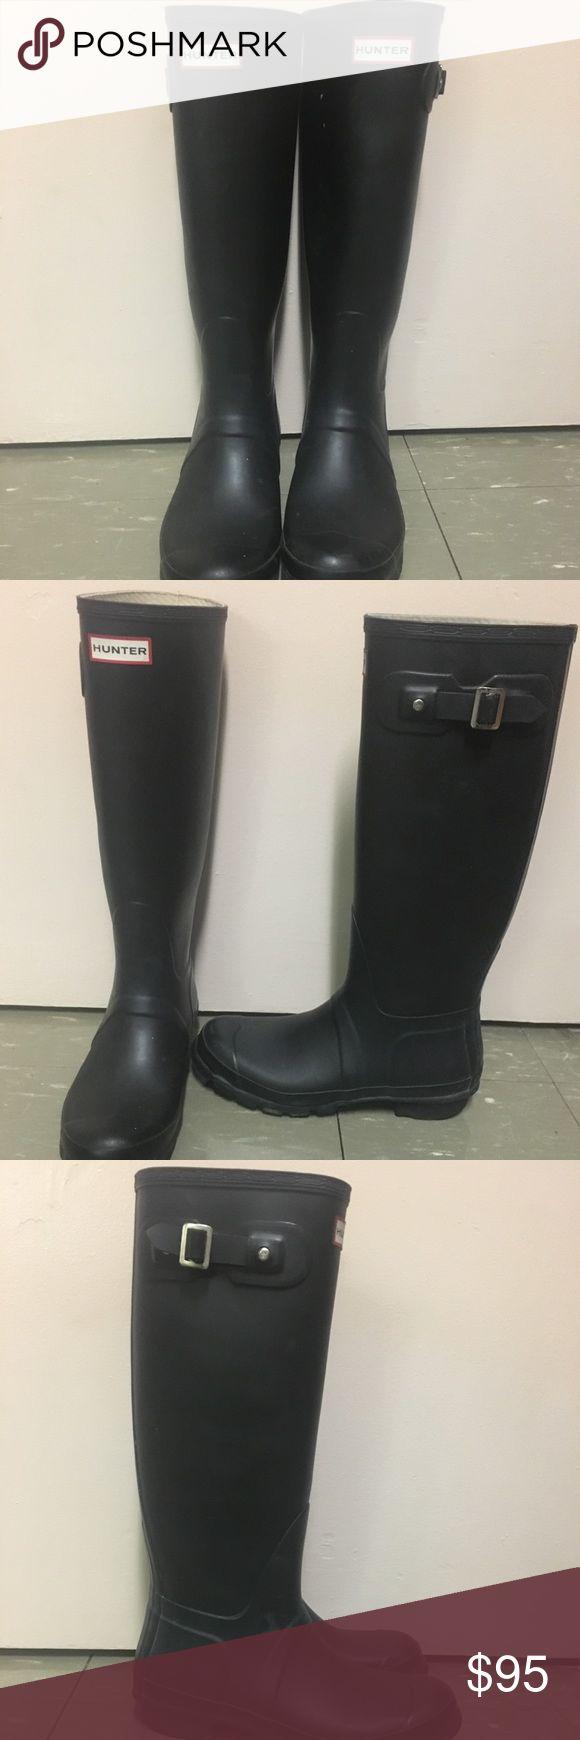 Tall Hunter Rain boots Tall black hunter rain boots have been worn but still in good shape Hunter Boots Shoes Winter & Rain Boots